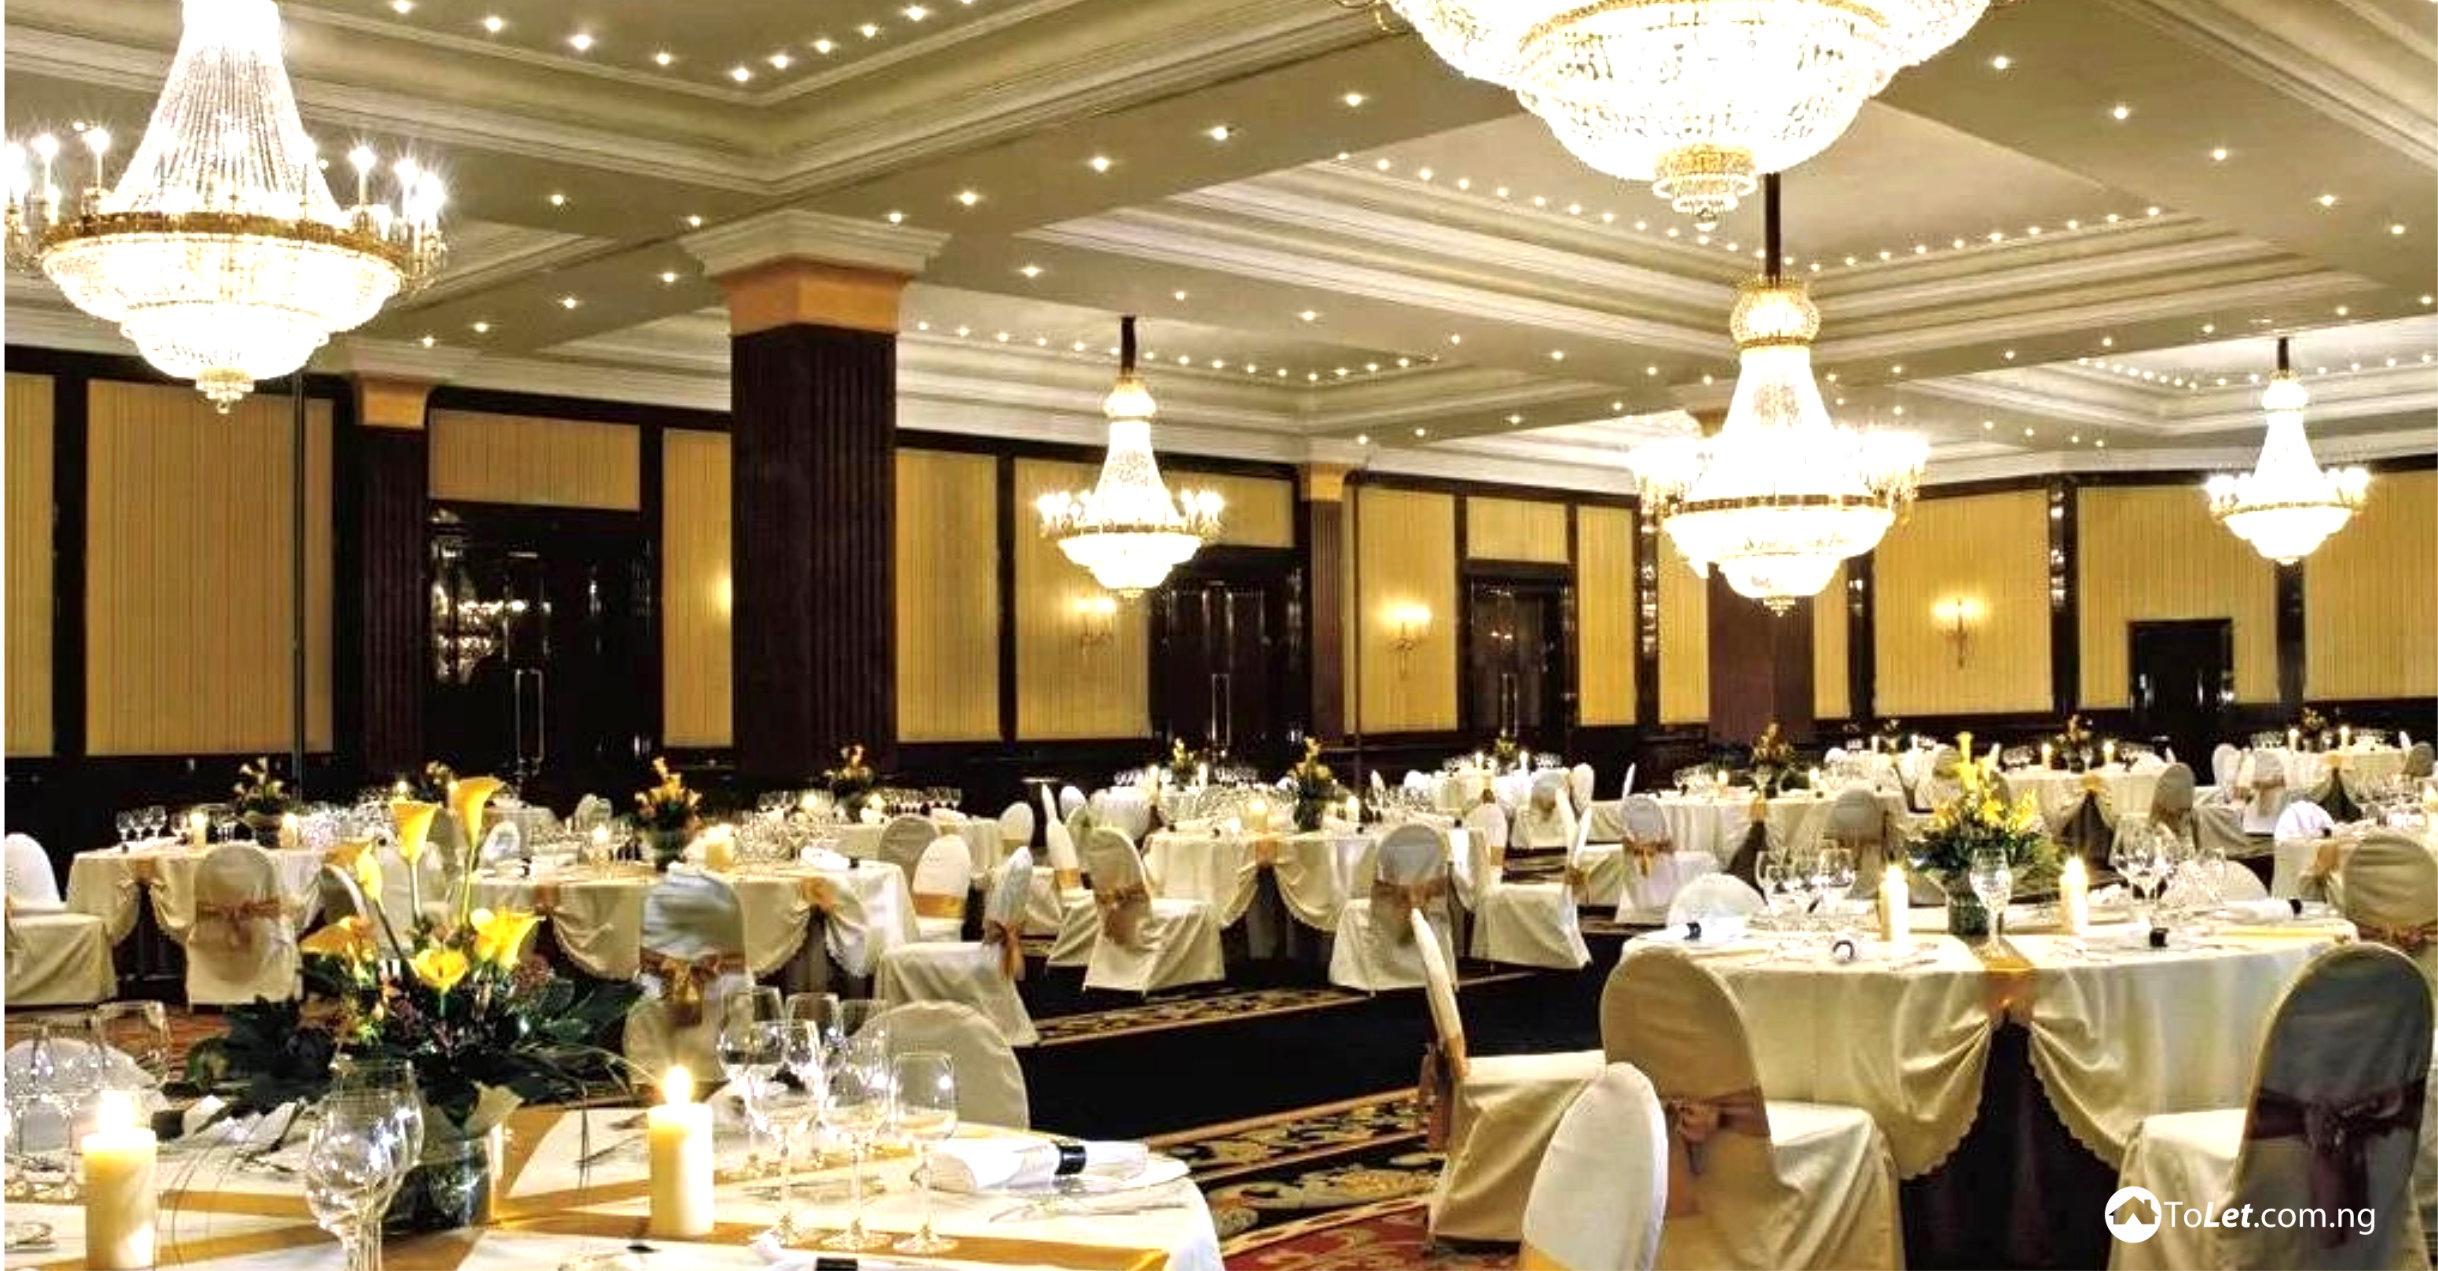 Top Event Centers In Nigeria Propertypro Insider